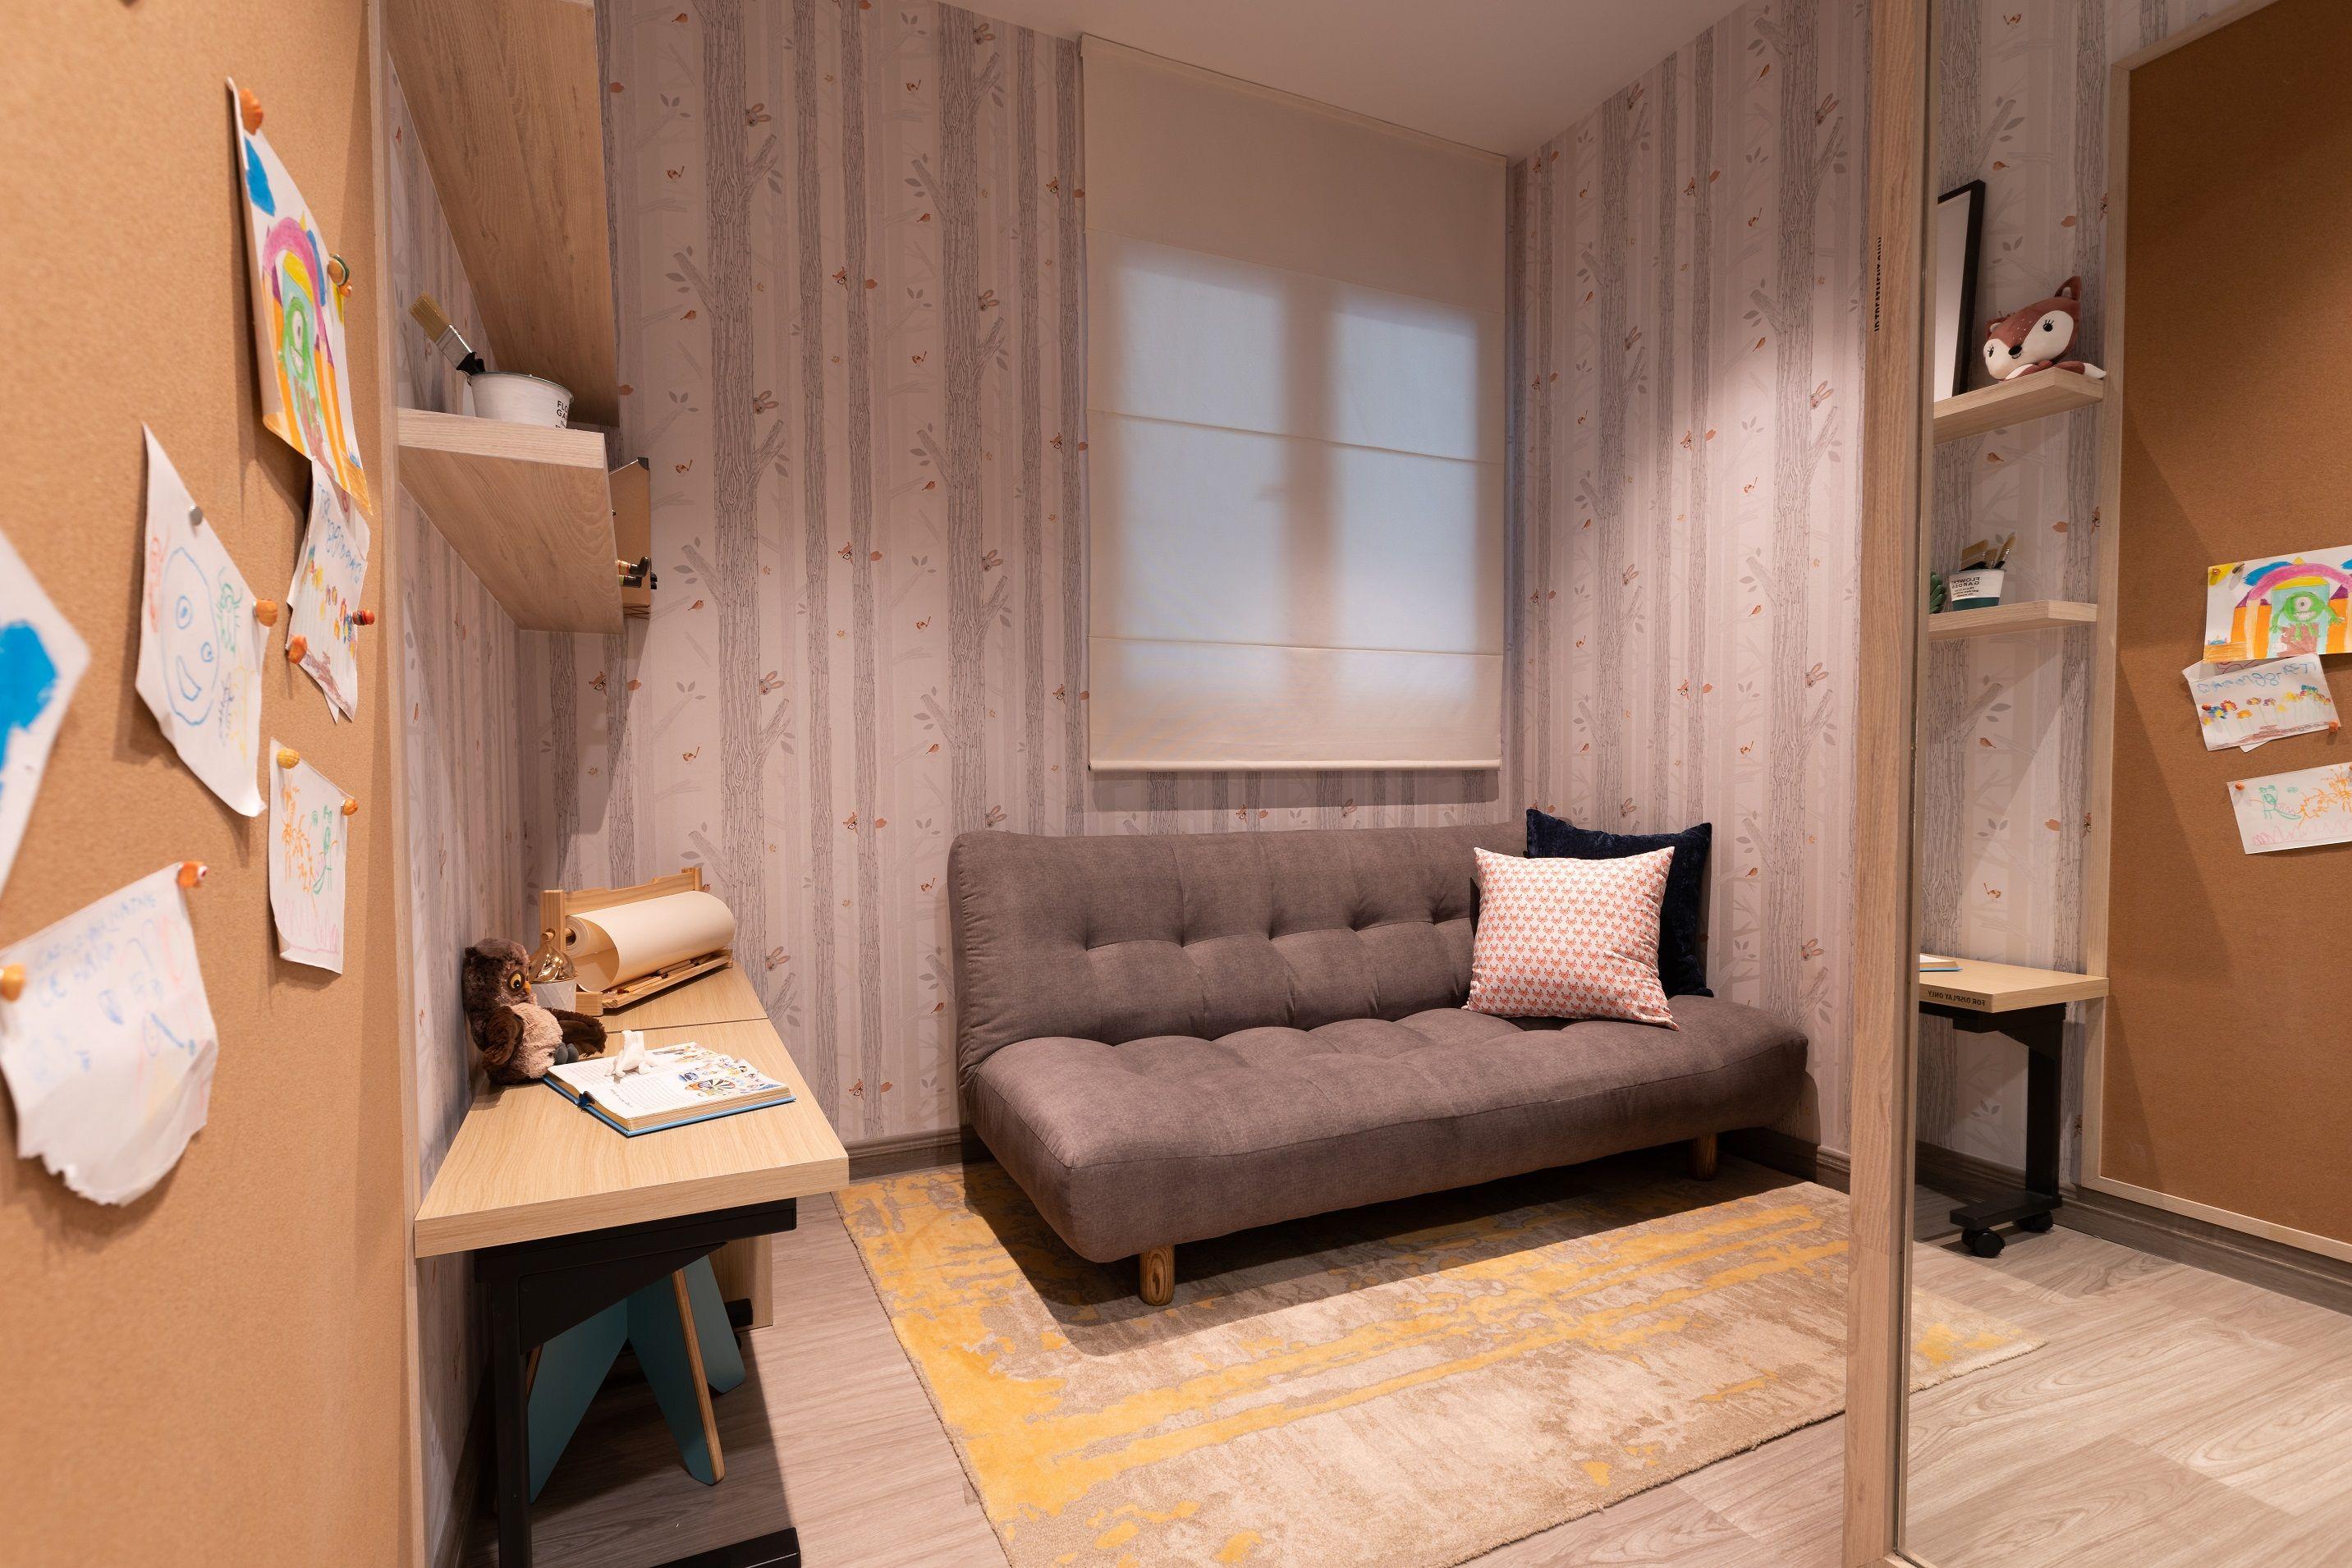 Arcuz Kelana Jaya Home Modern Design Spacious